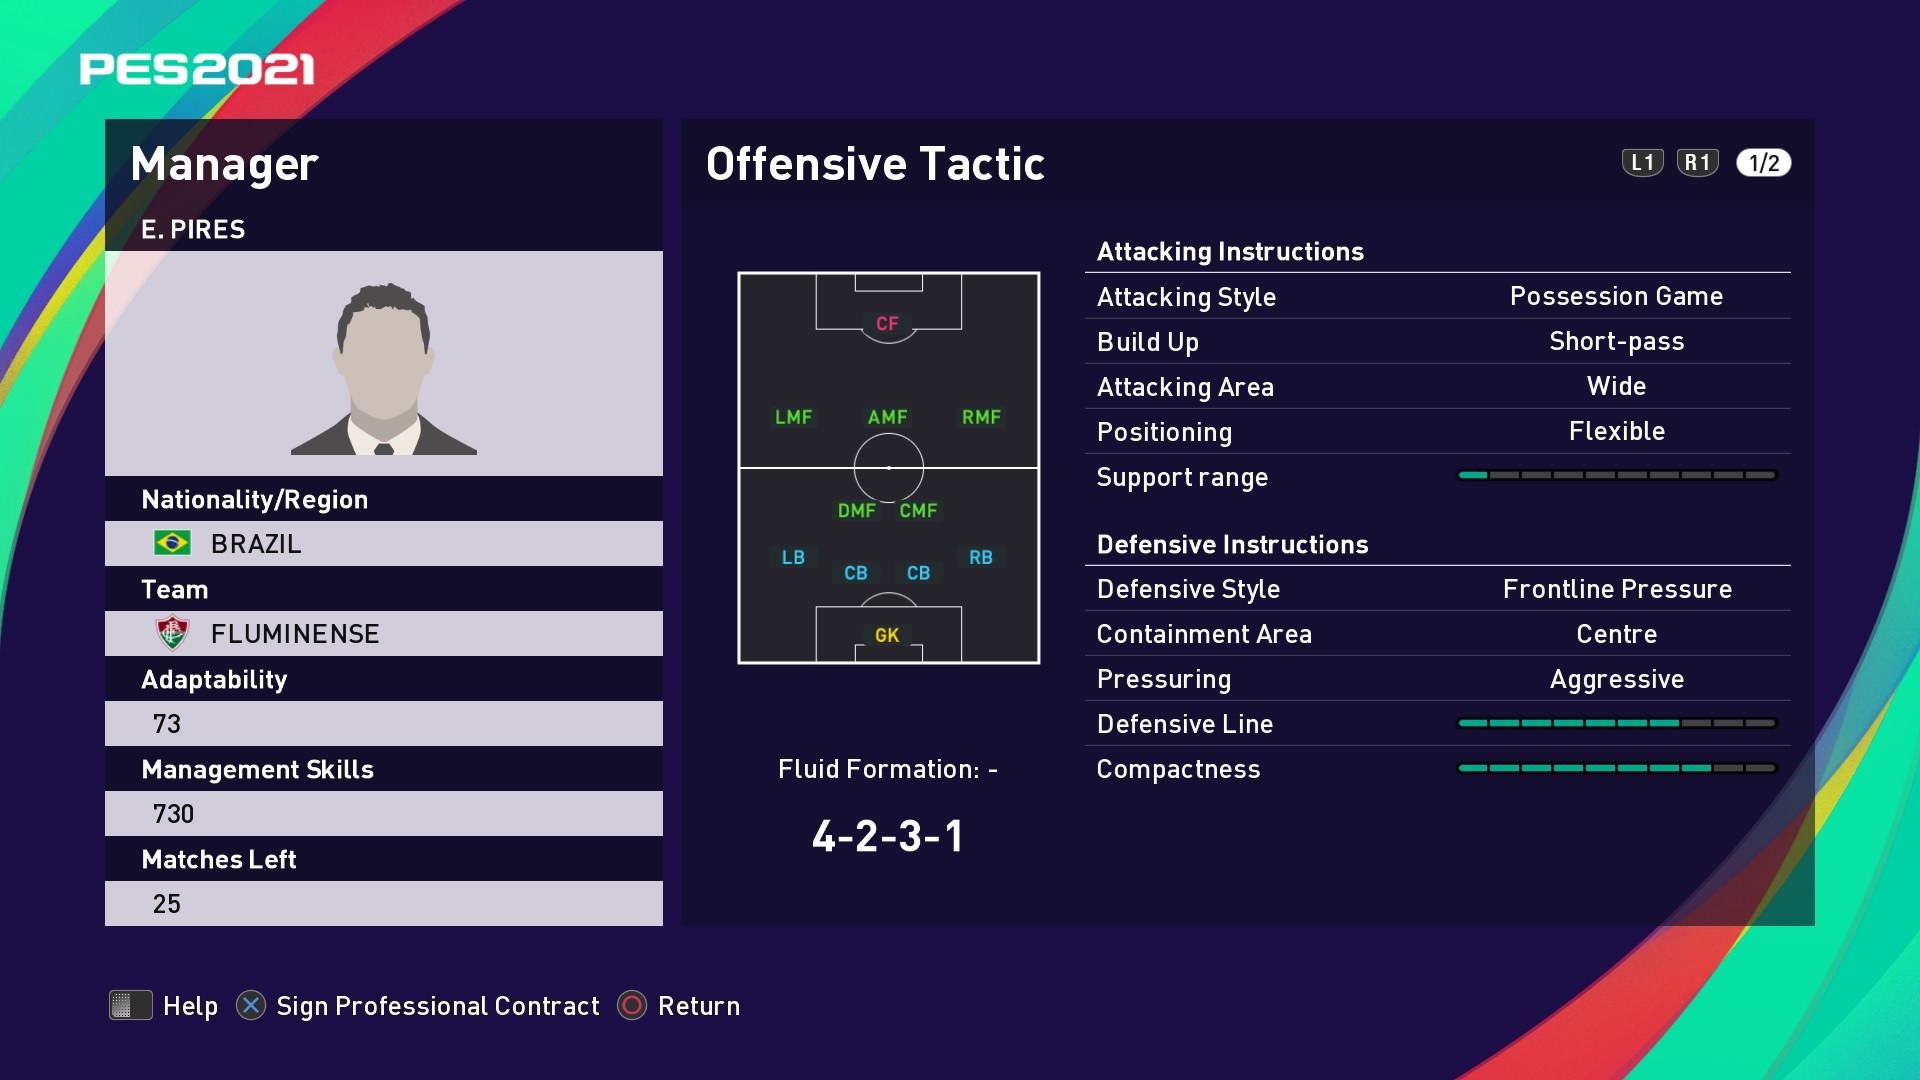 E. Pires (Odair Hellmann) Offensive Tactic in PES 2021 myClub